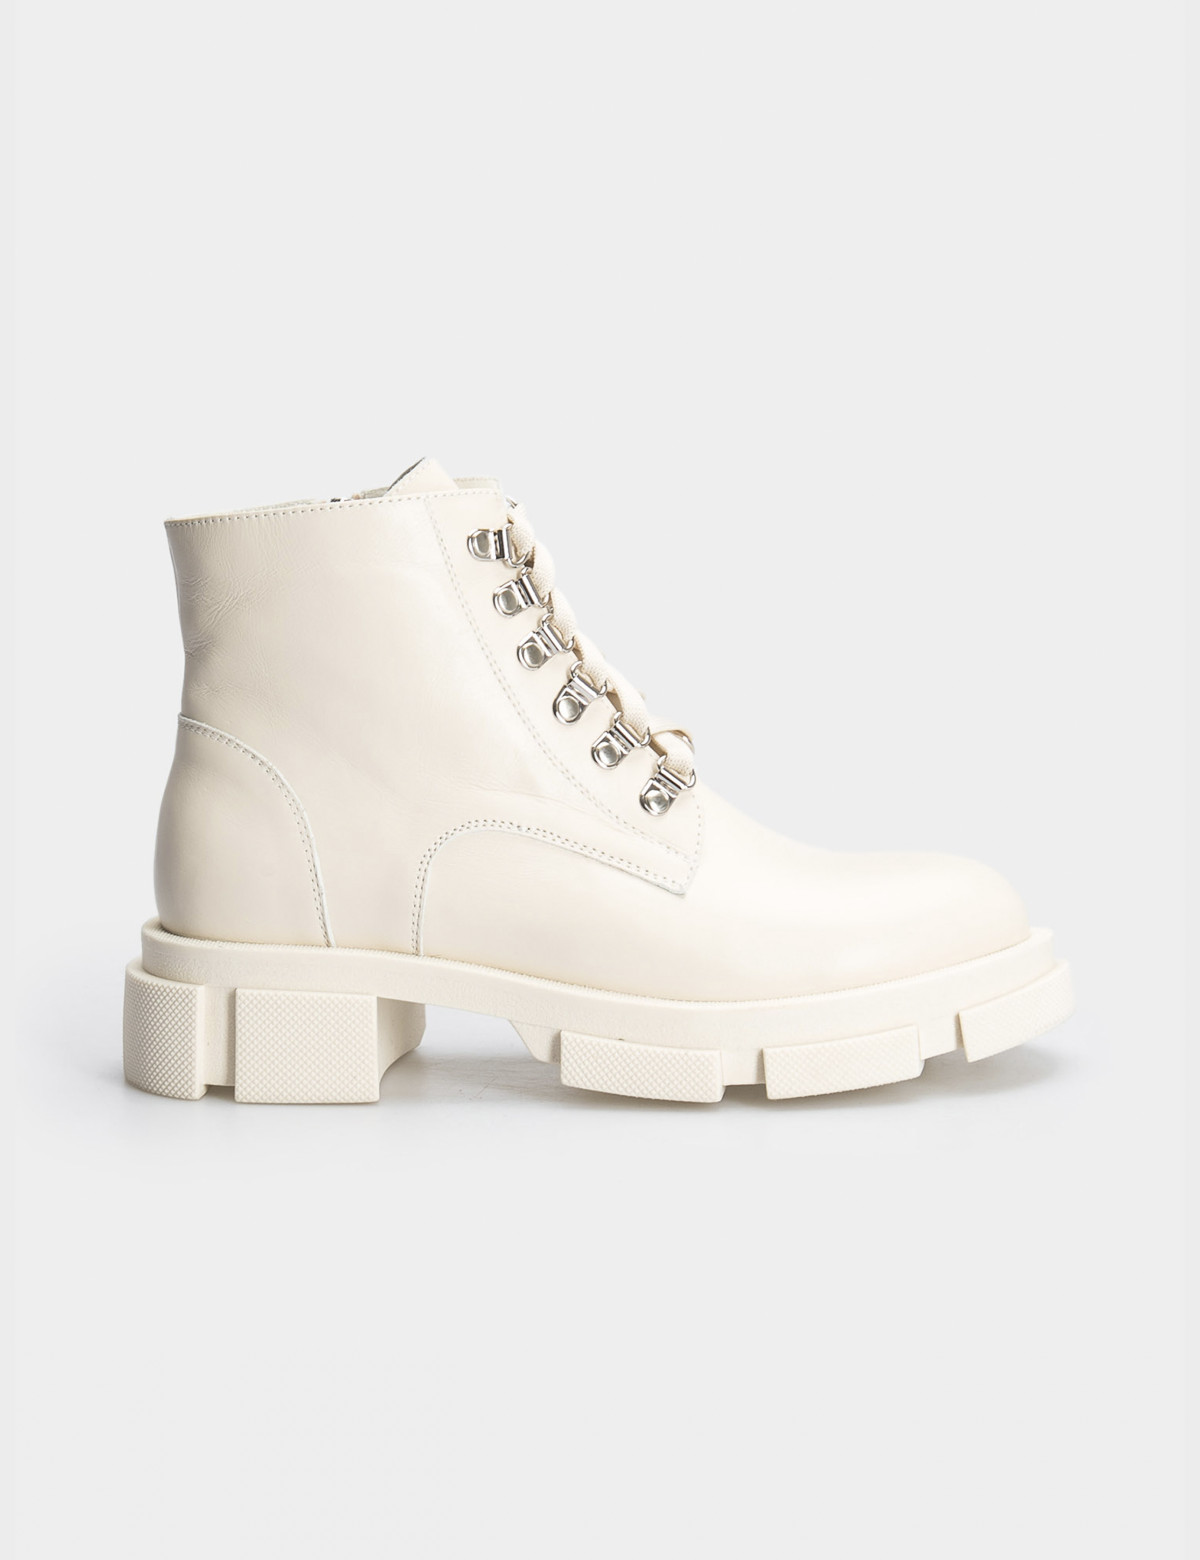 Ботинки бежевые. Натуральная кожа. Байка